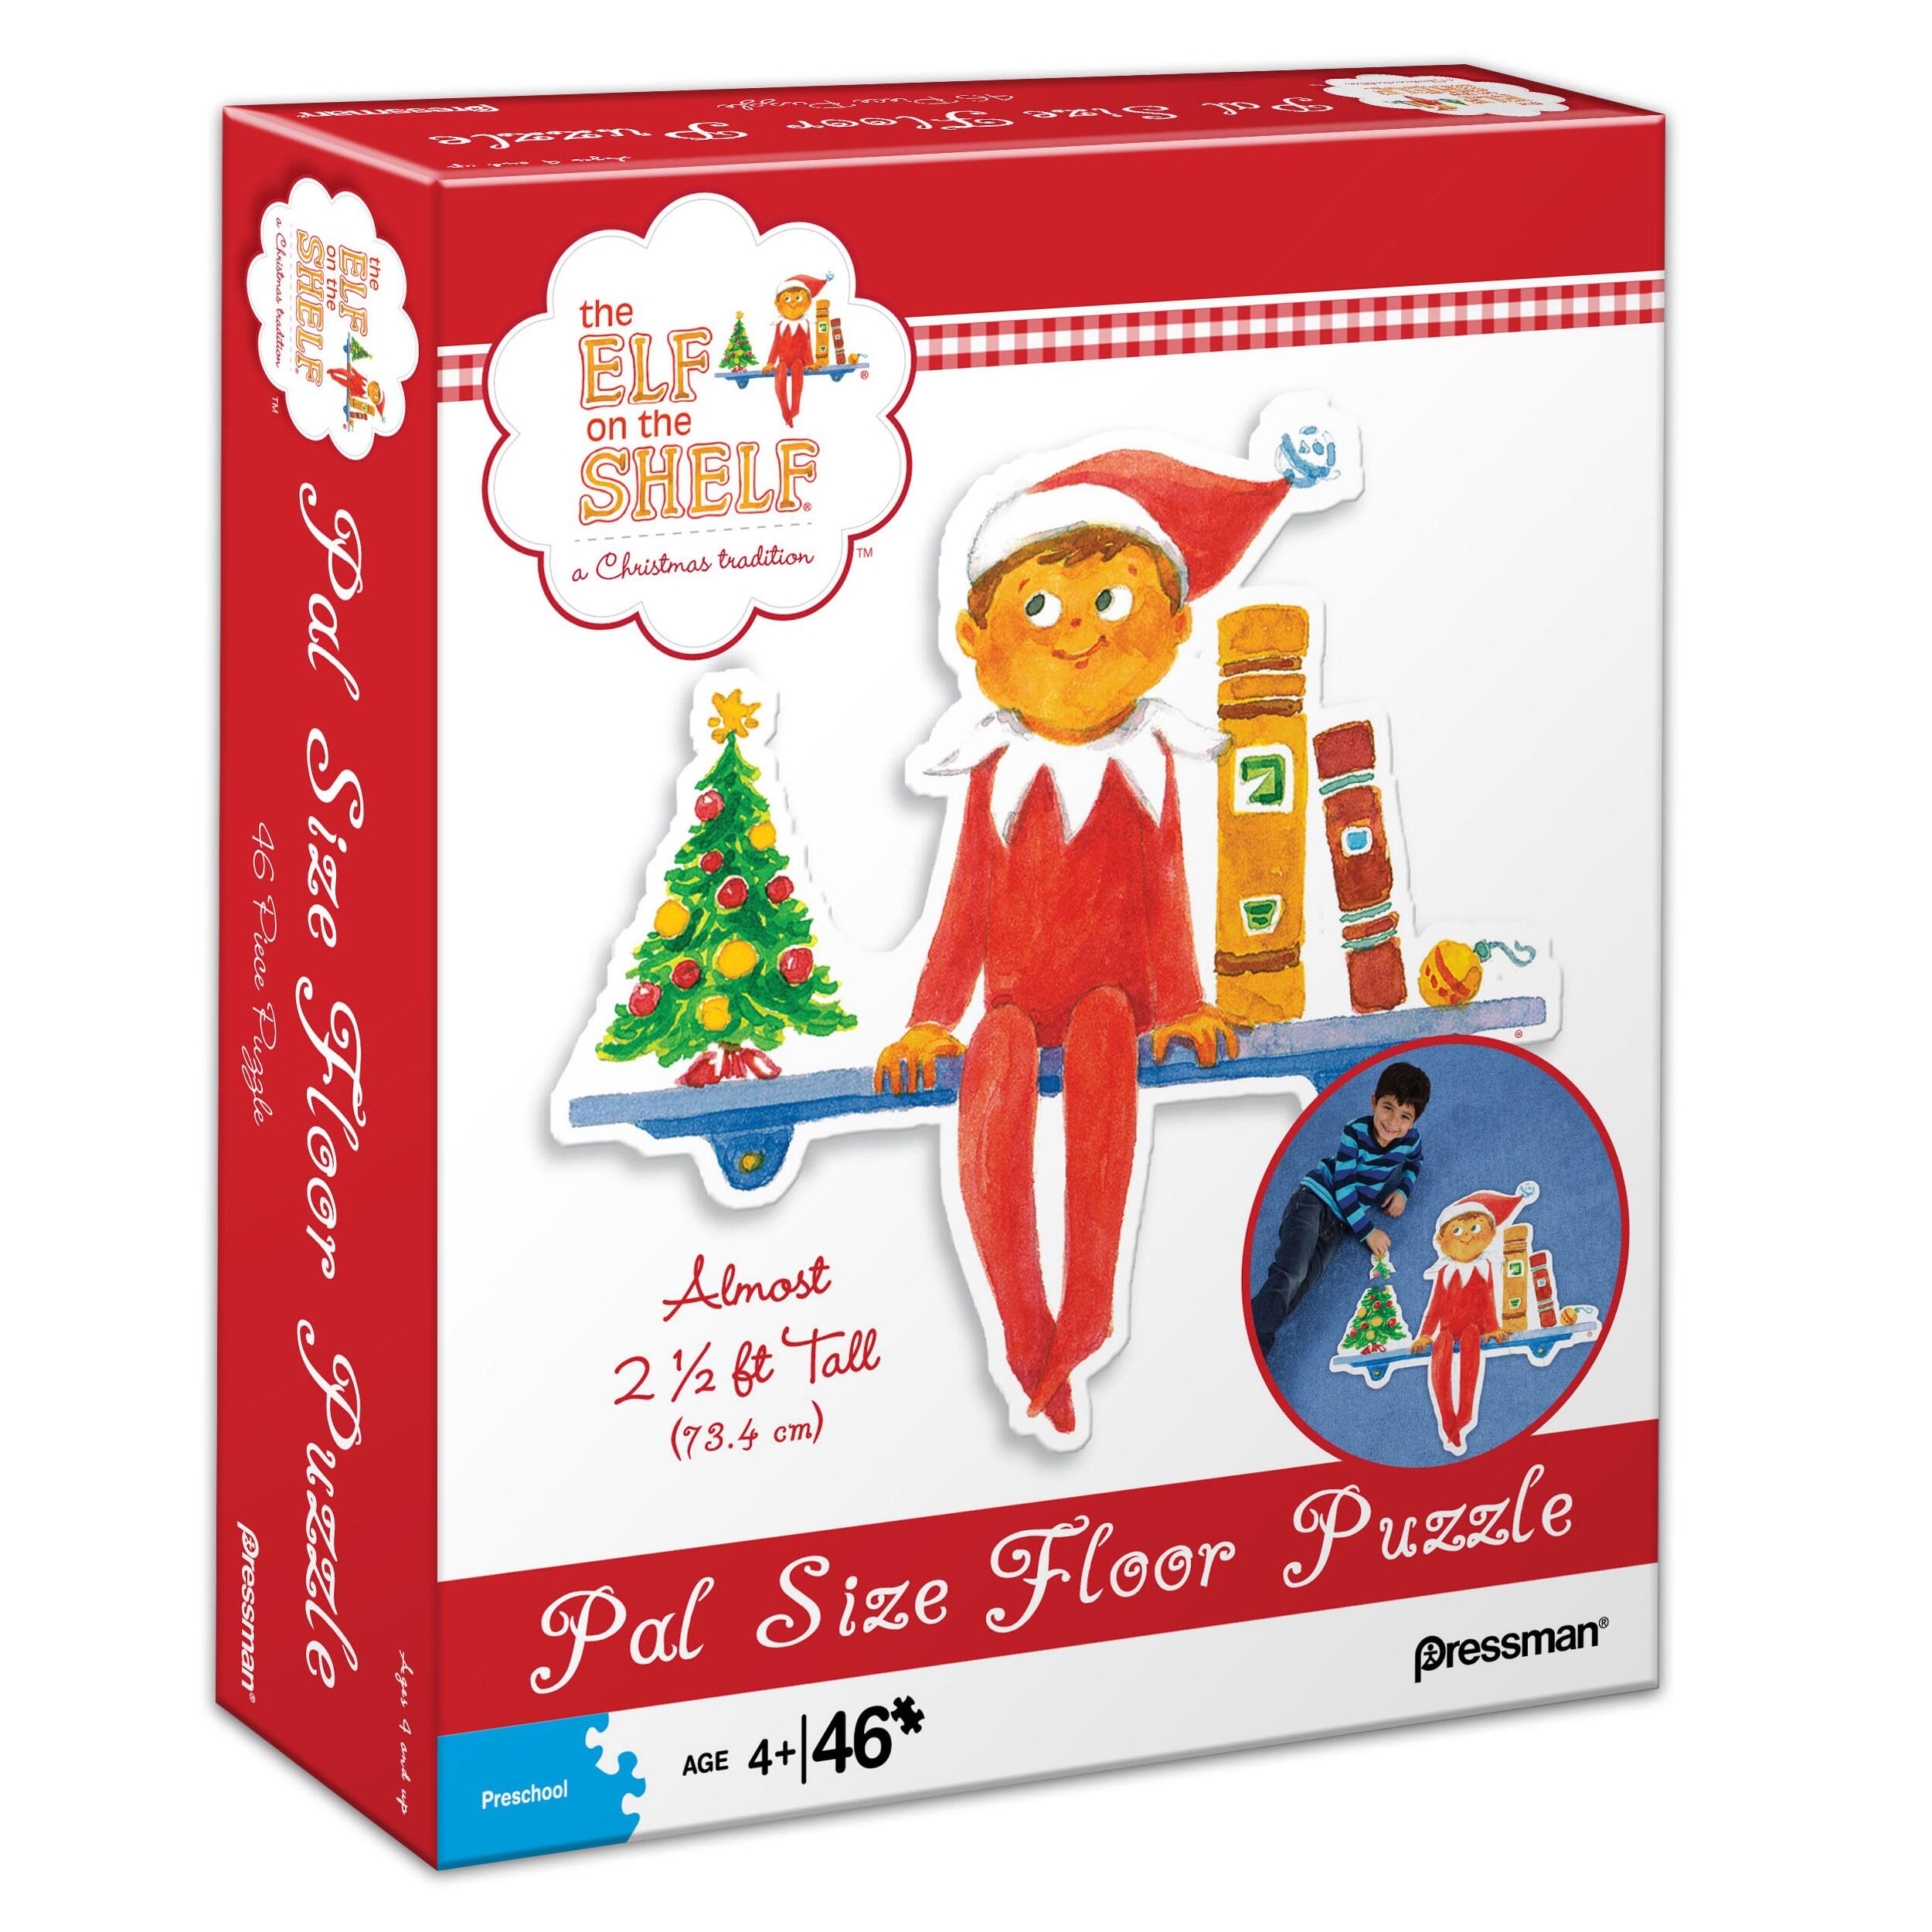 Pressman Toy The Elf on the Shelf Pal Size Floor Puzzle: ...